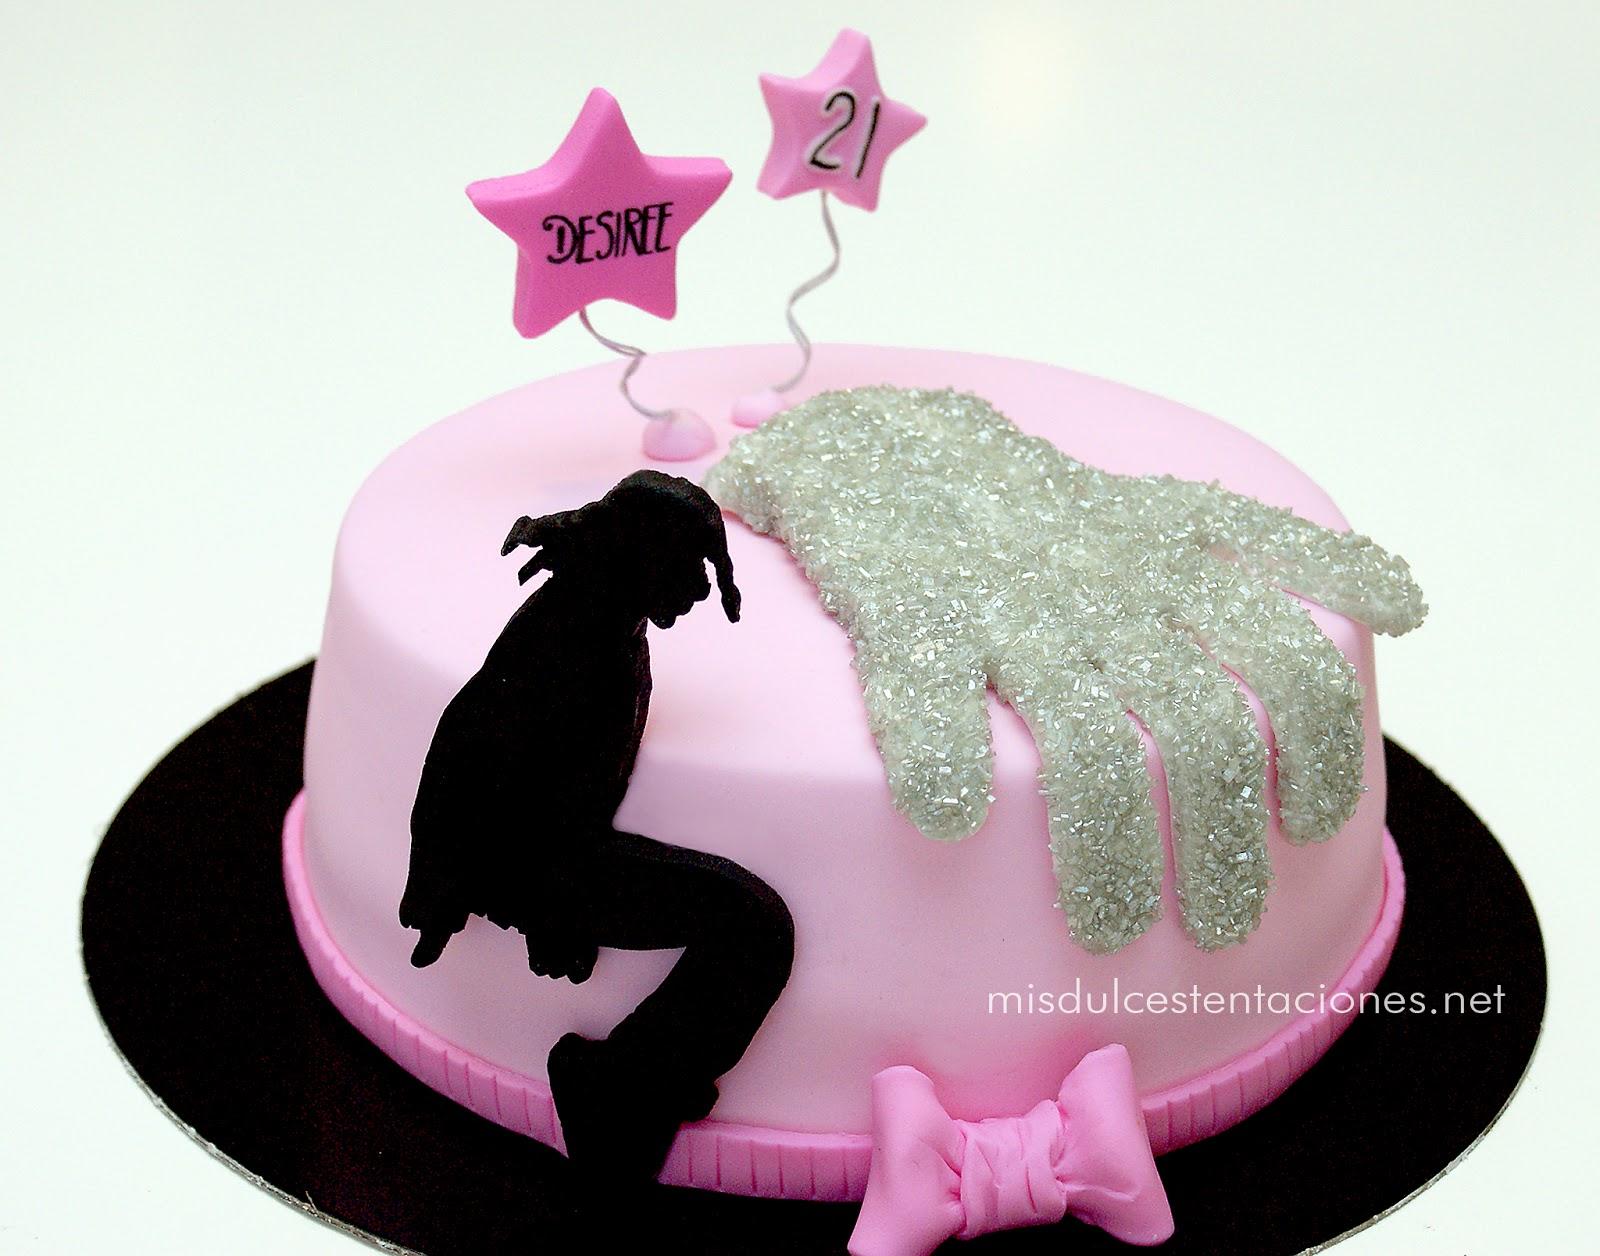 Michaels Cake Decorating Southgate Mi : mis dulces tentaciones - tartas, galletas, cupcakes ...